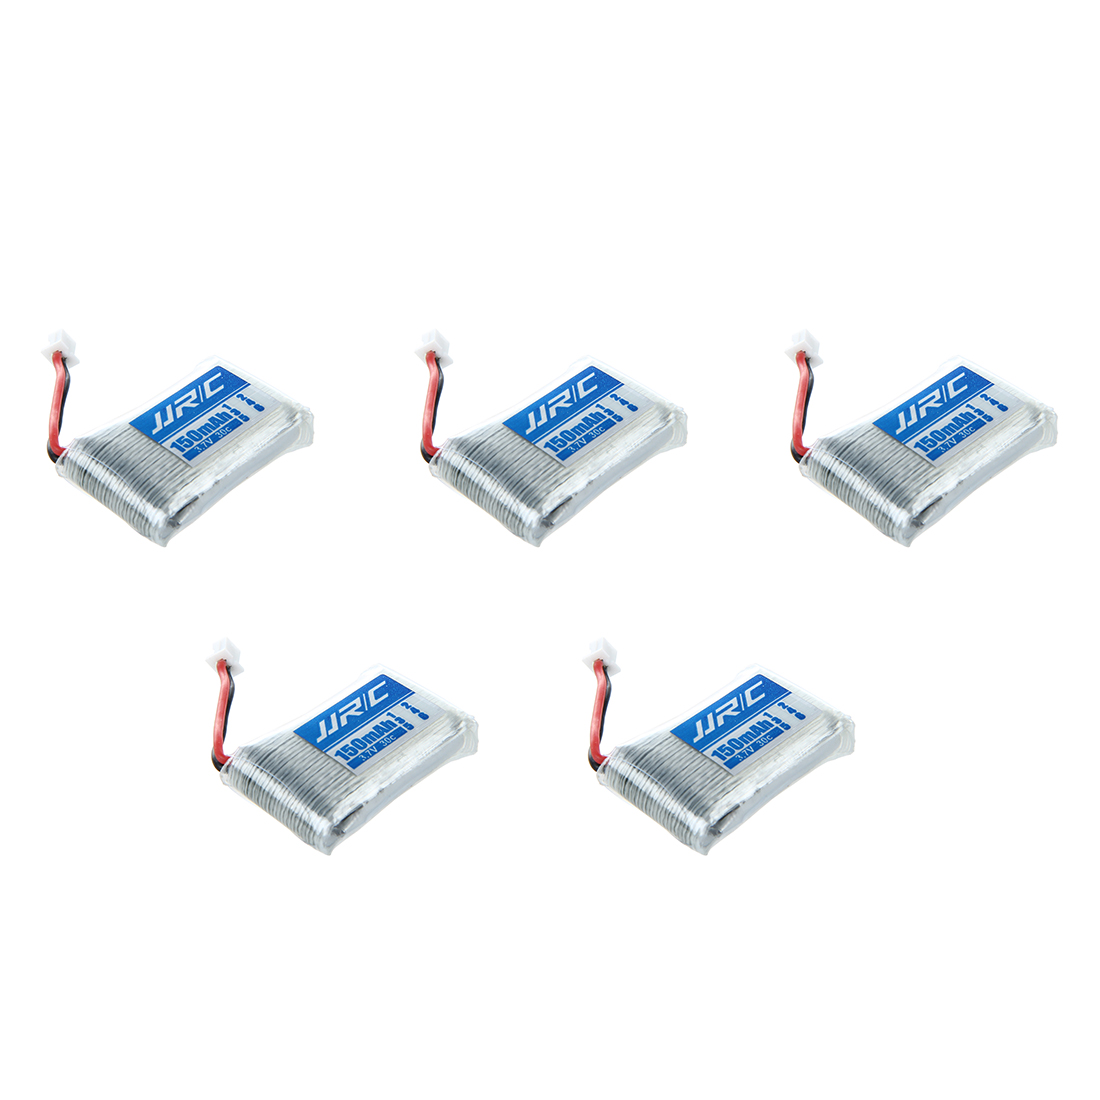 5 x 3.7V 150mAh 30C Battery +1 x Charger USB Cable Set